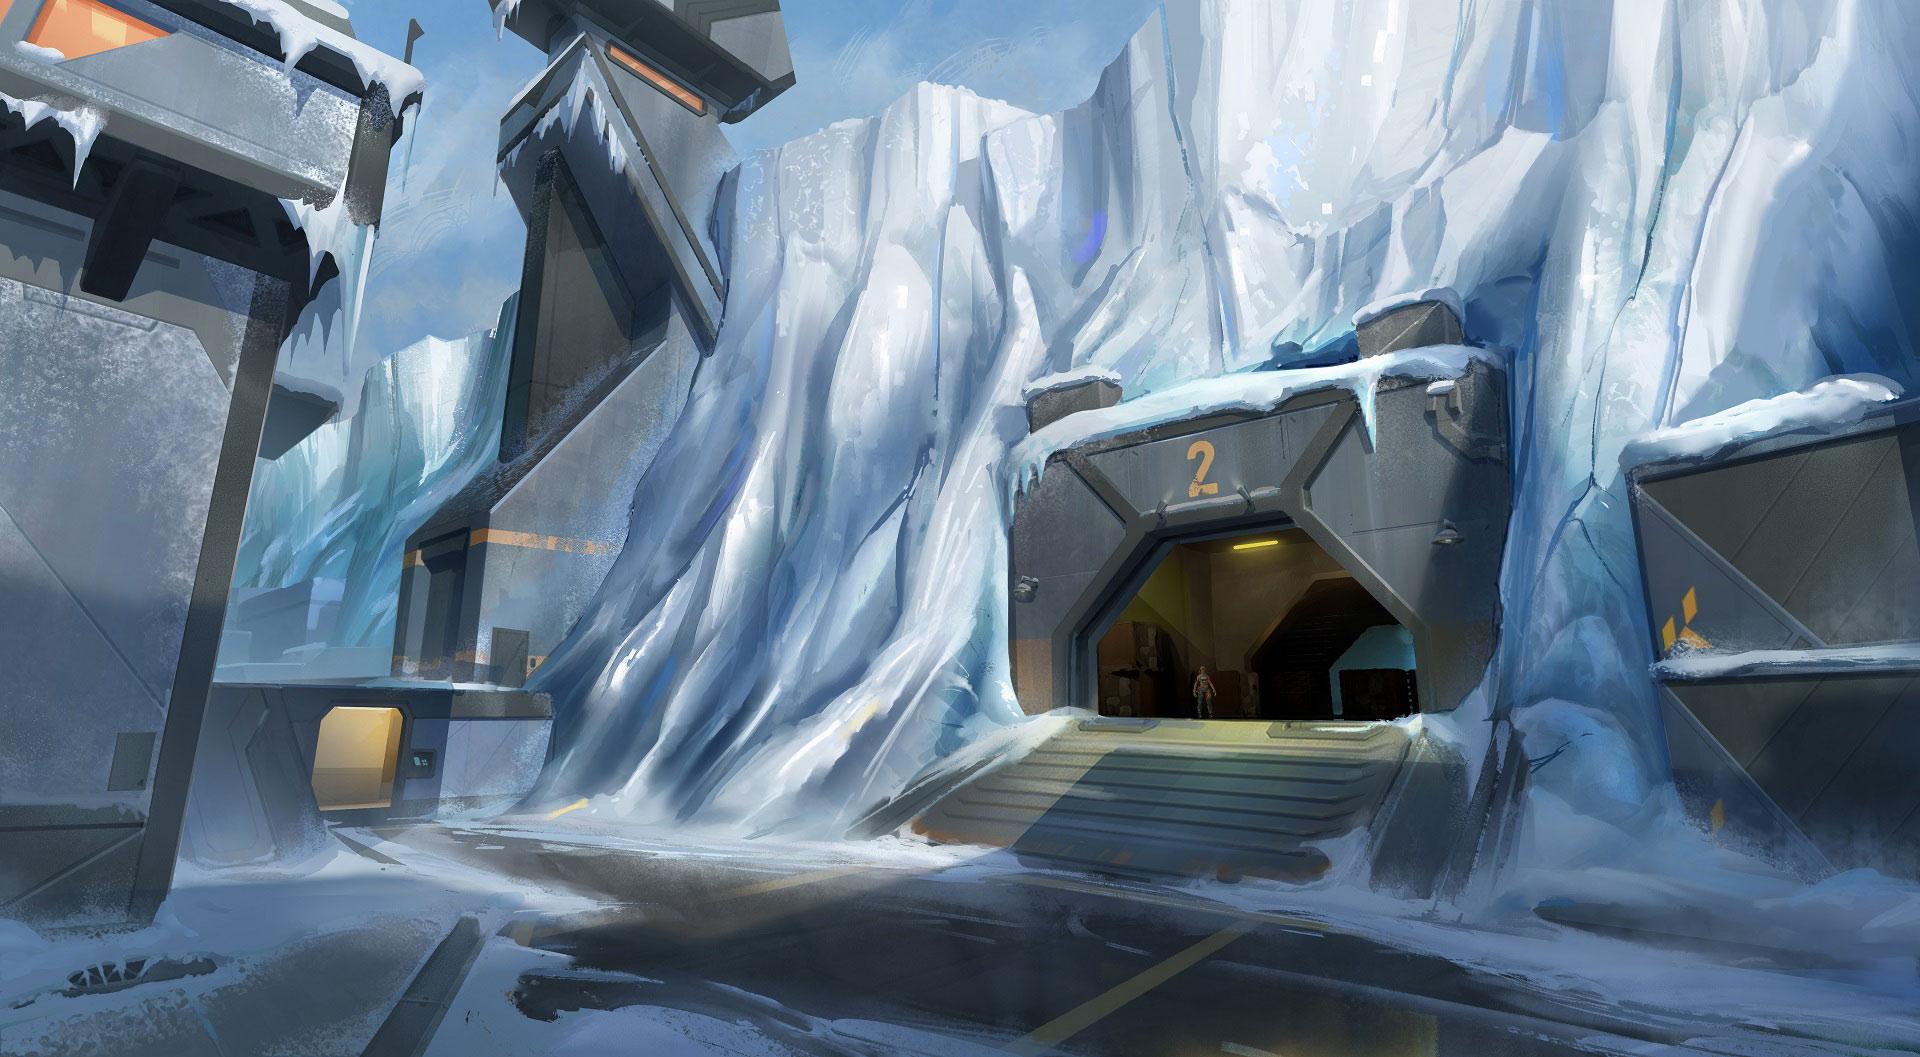 Icebox_ConceptB_v2.jpg